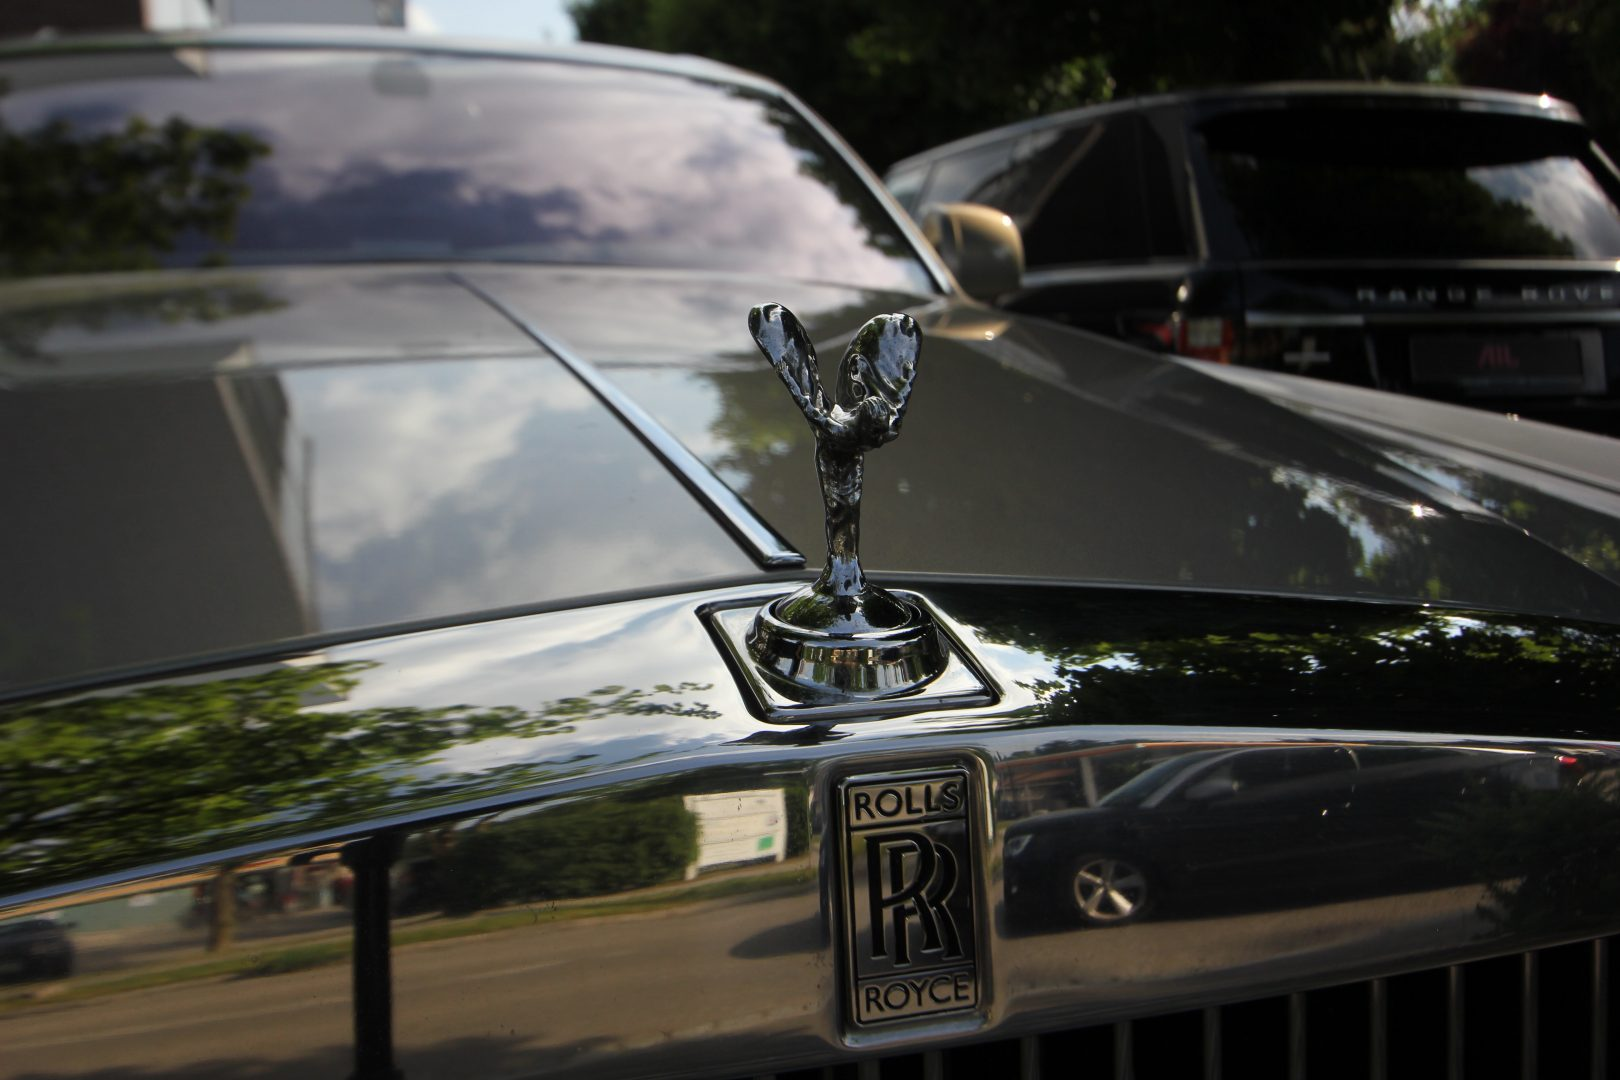 AIL Rolls Royce Phantom Mansory Sternenhimmel  16